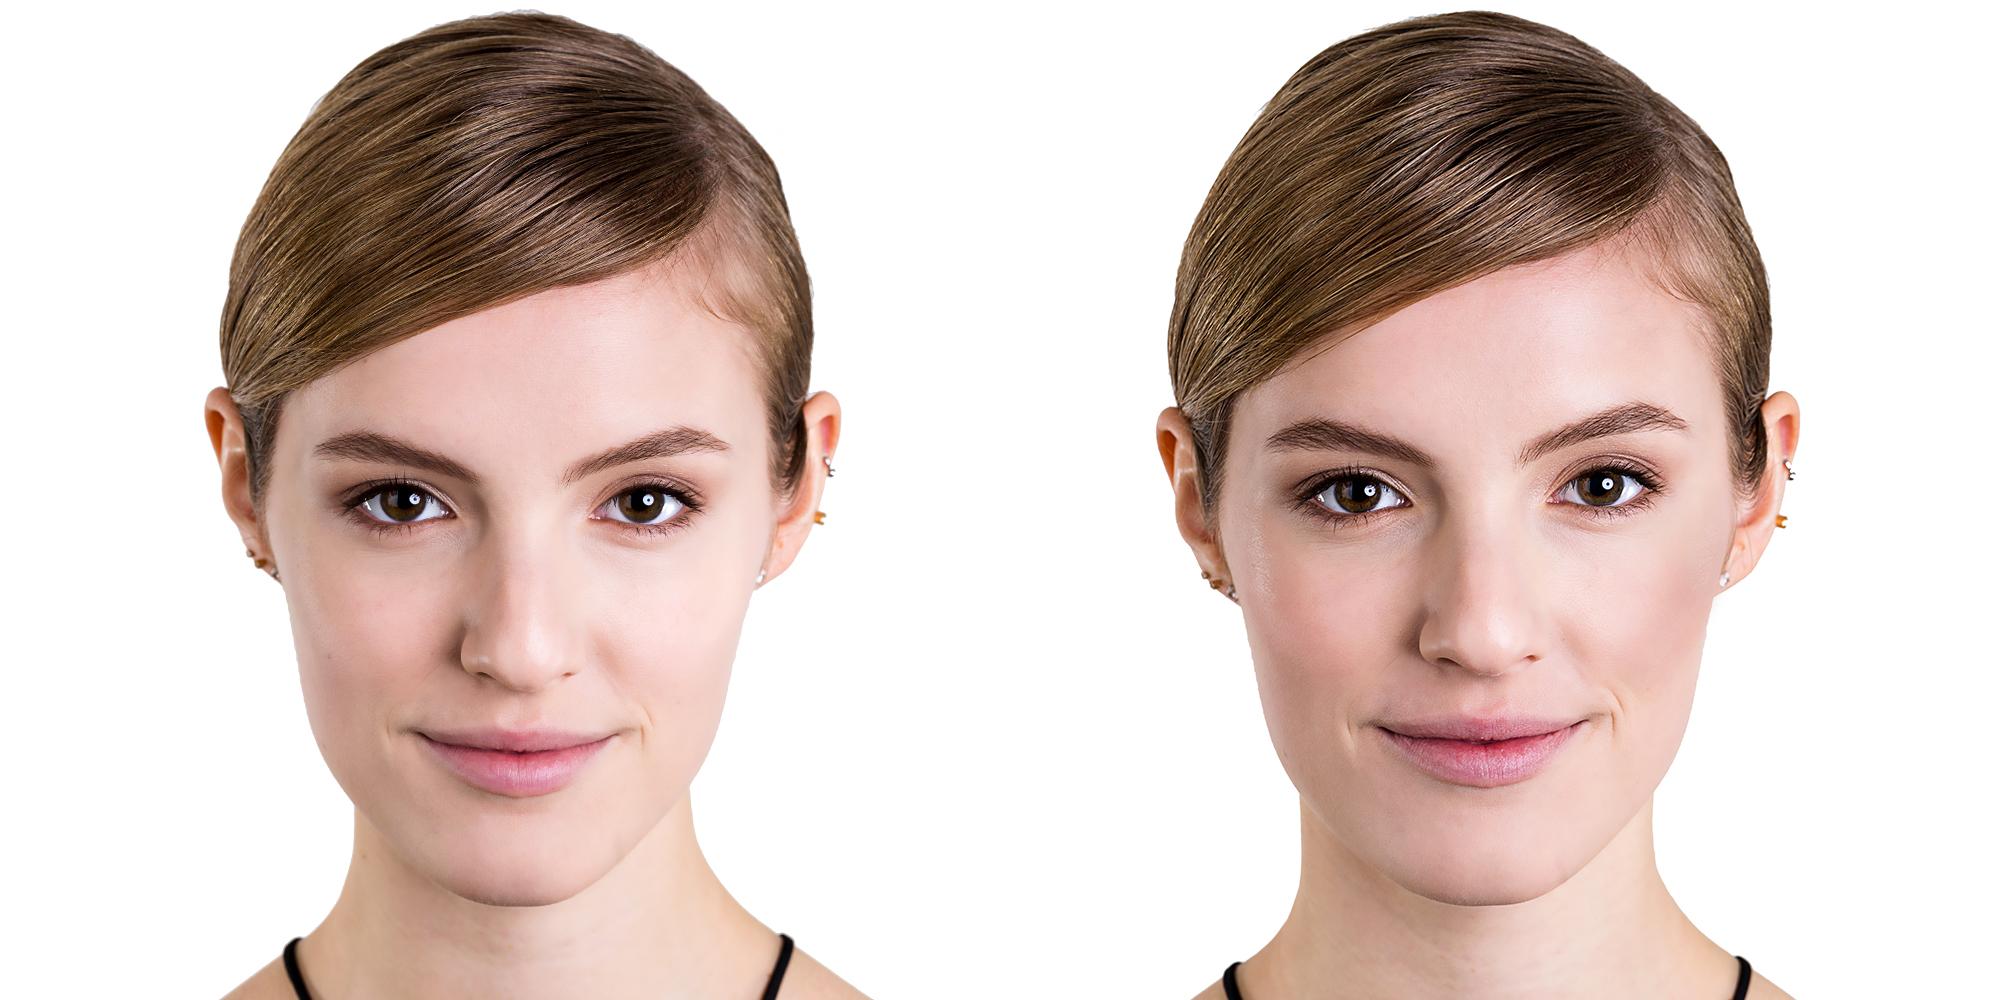 How To Define Cheekbones